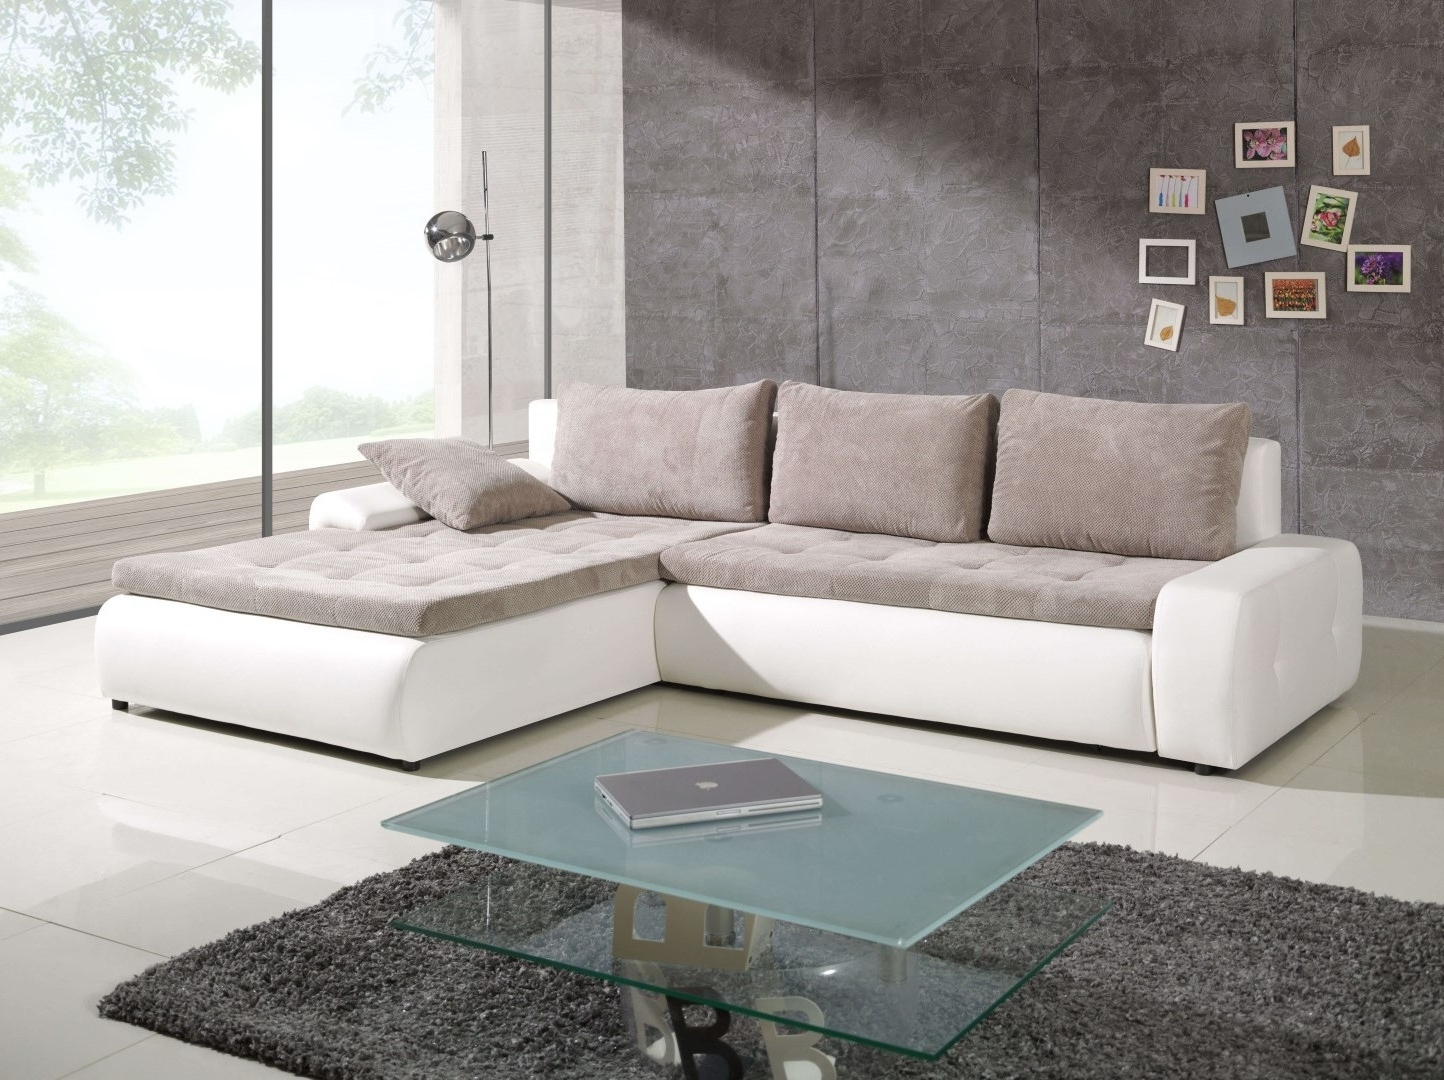 Latest Shop Galileo Sectional Sleeper Sofa With Storage Universal With Sectional Sofas With Sleeper (View 13 of 15)